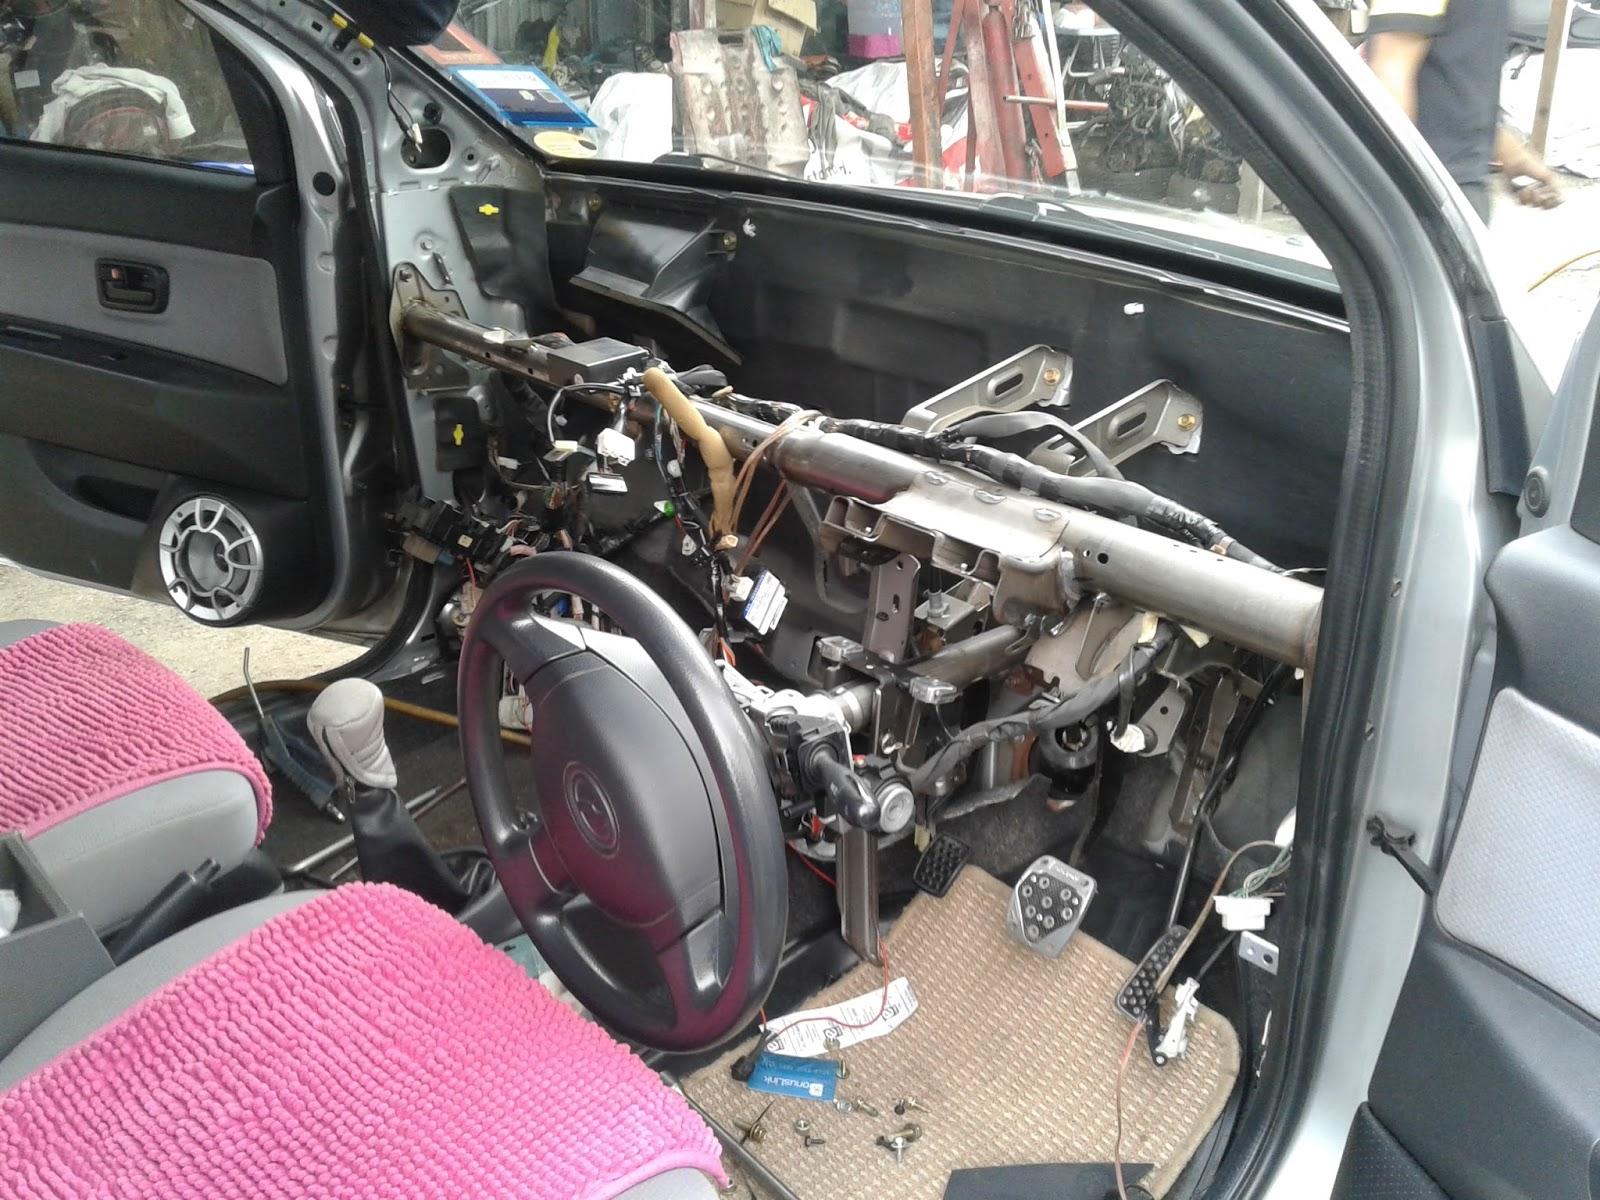 Hose Aircond Myvi Img 4bpblogspotcom Uxj 8uocsqu Vt4bnny2 Ci Evaporator Daihatsu Siron Denso Full System Service